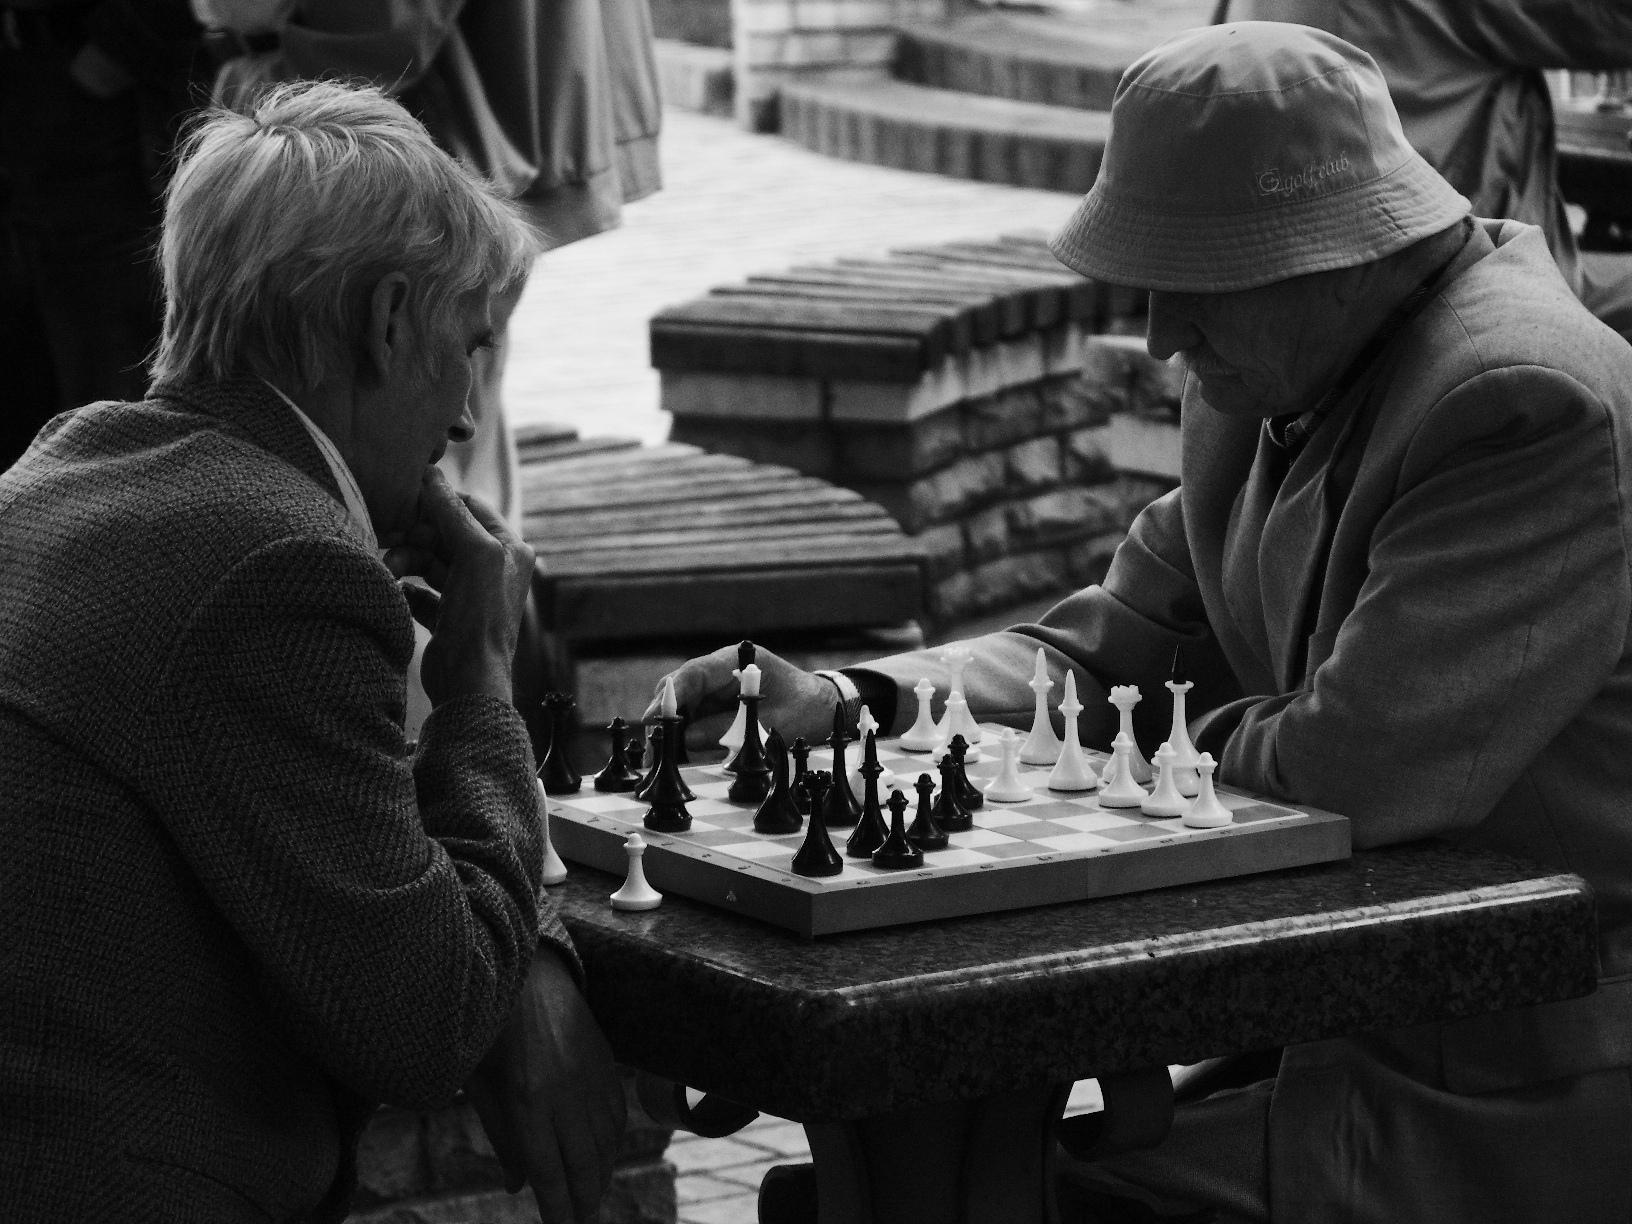 http://upload.wikimedia.org/wikipedia/commons/0/0d/Chess_players_in_park,_kiev_2.JPG